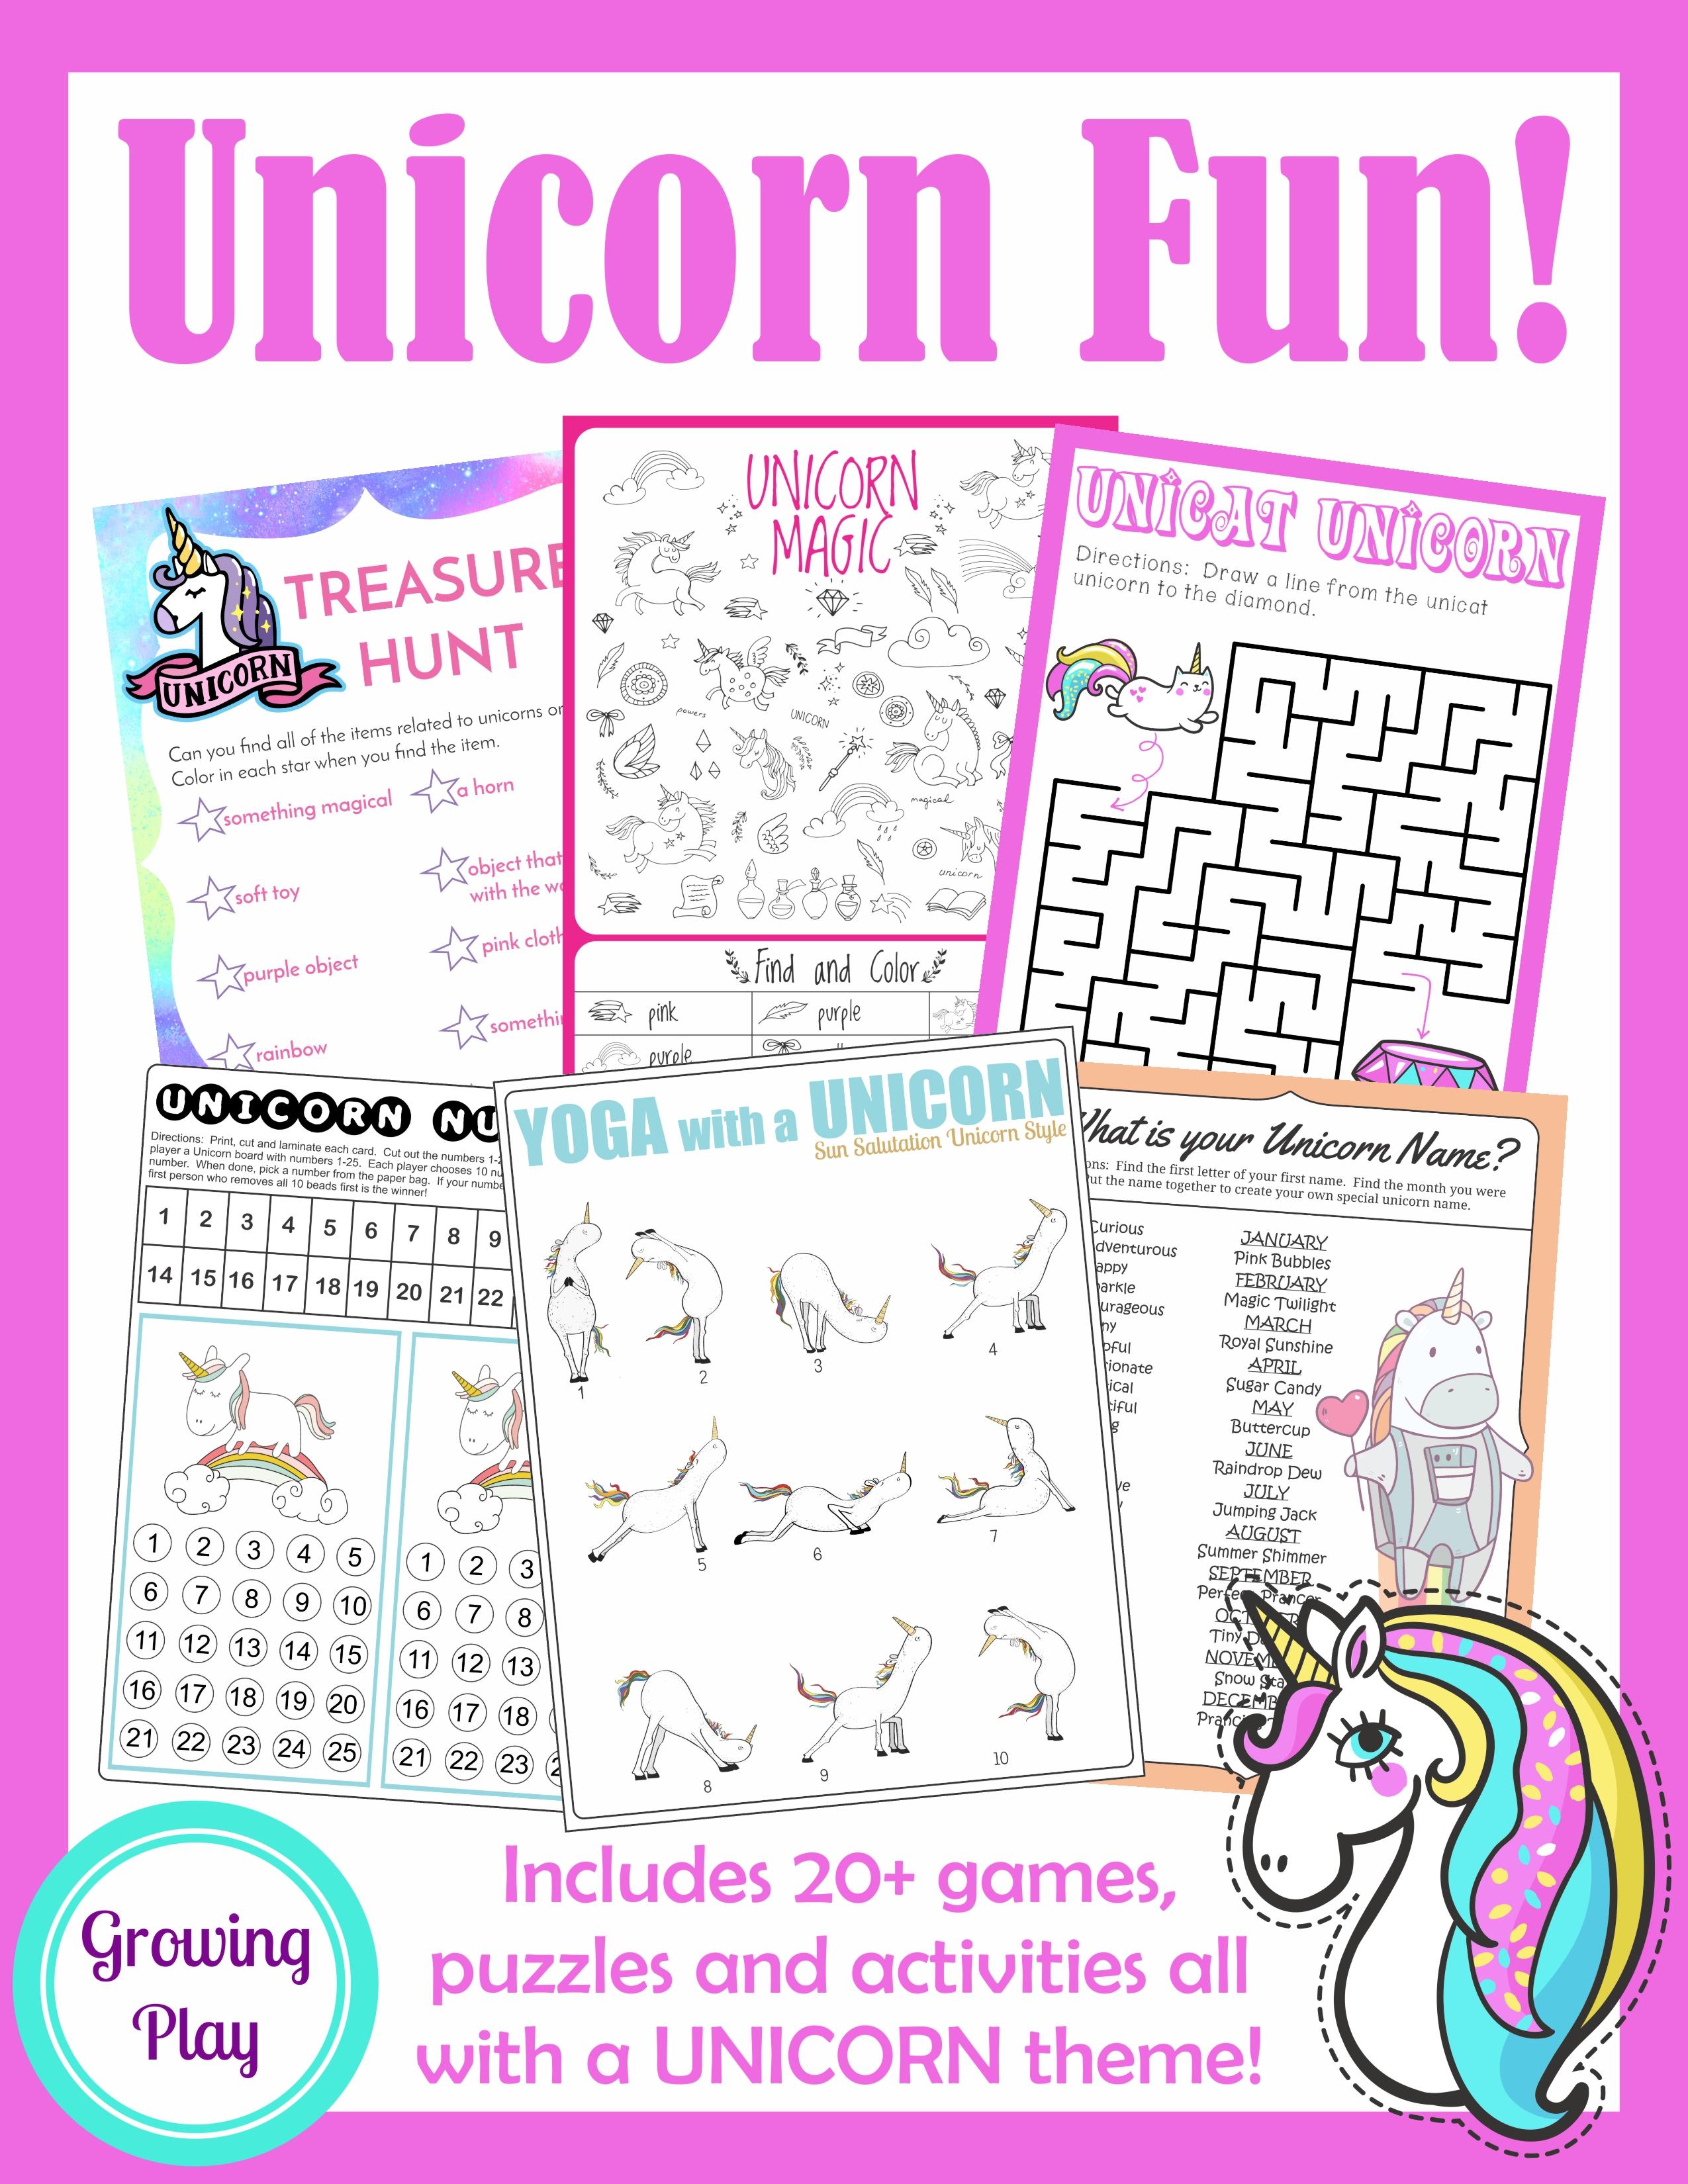 Unicorn Mini Journal - Free Printable - Growing Play - Printable Unicorn Puzzle